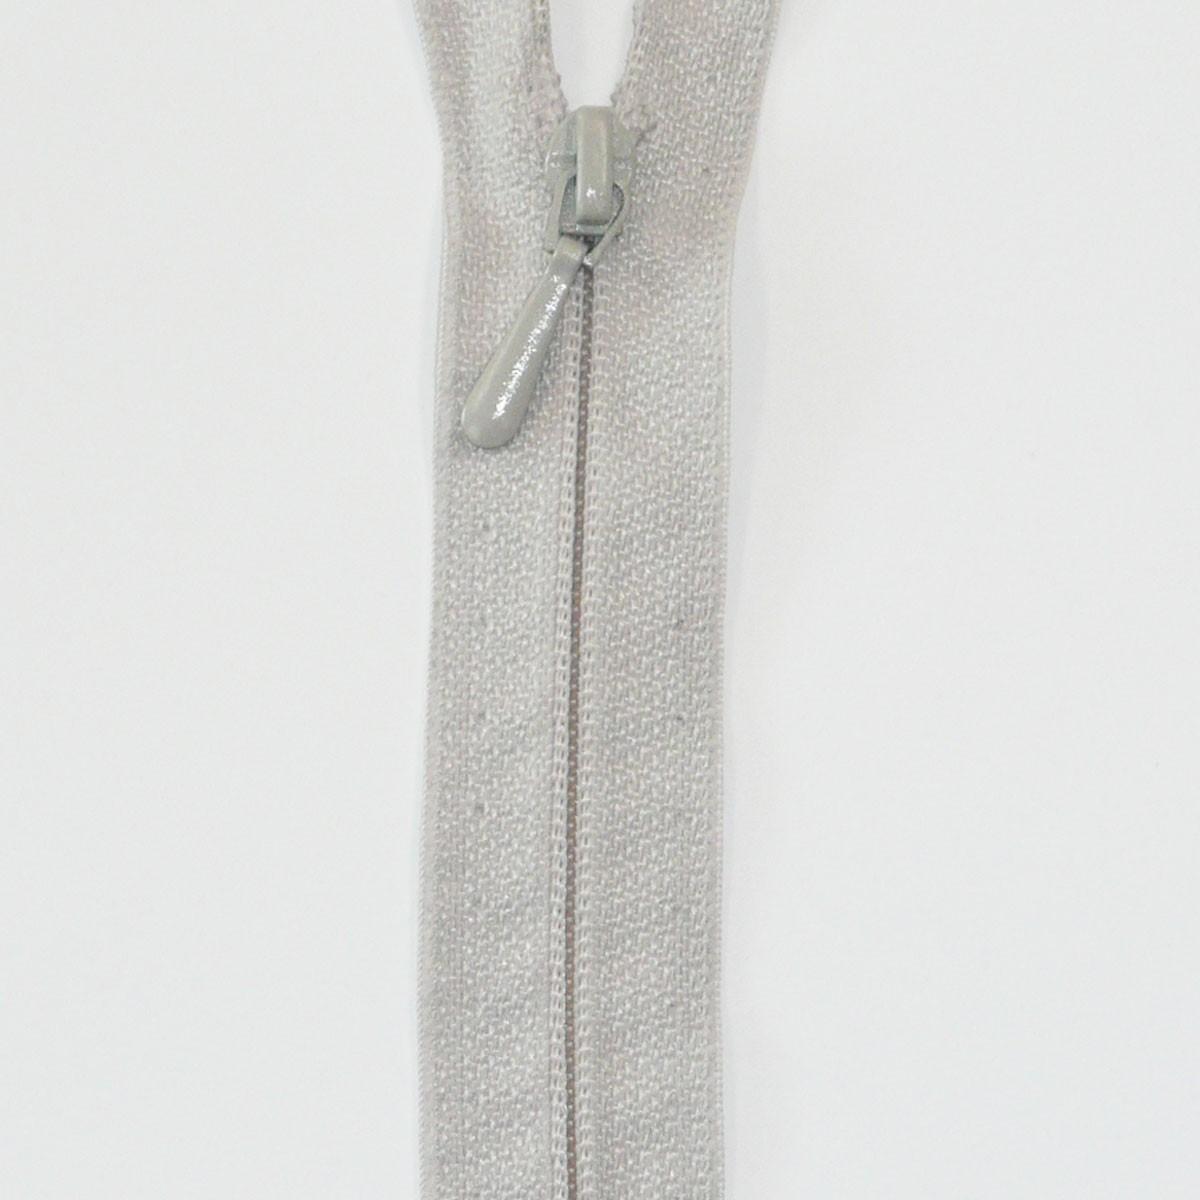 Reißverschluss S2 Typ 0 Nahtfein 30 cm Fla si-grau